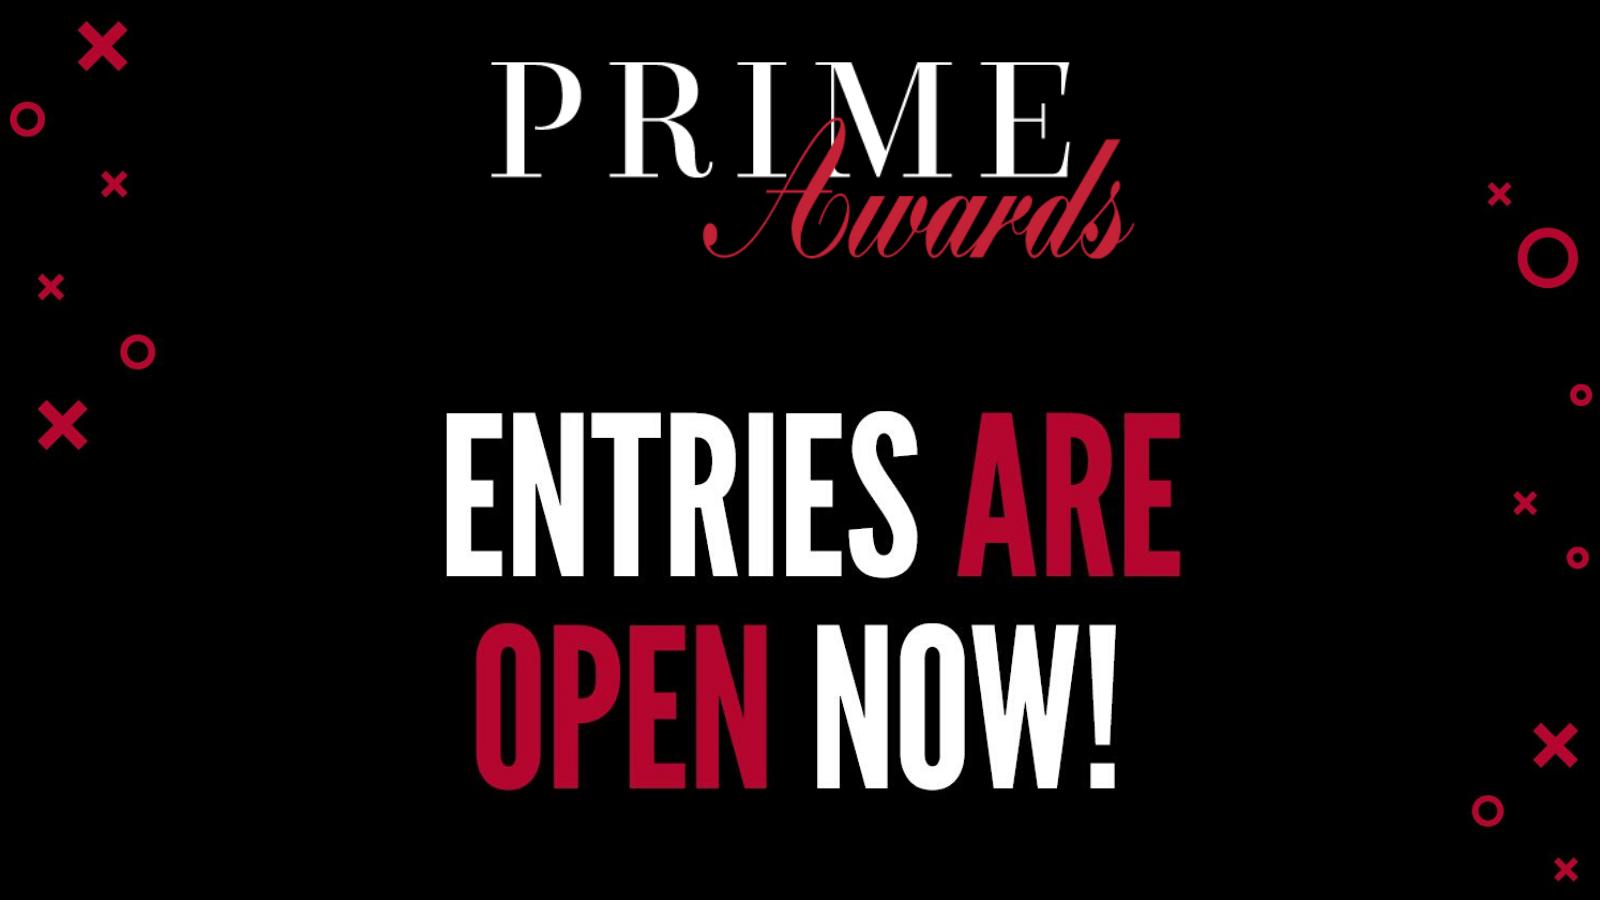 Marketing Pharma Biotech Healthcare - PRIME Awards 2020 call for entries